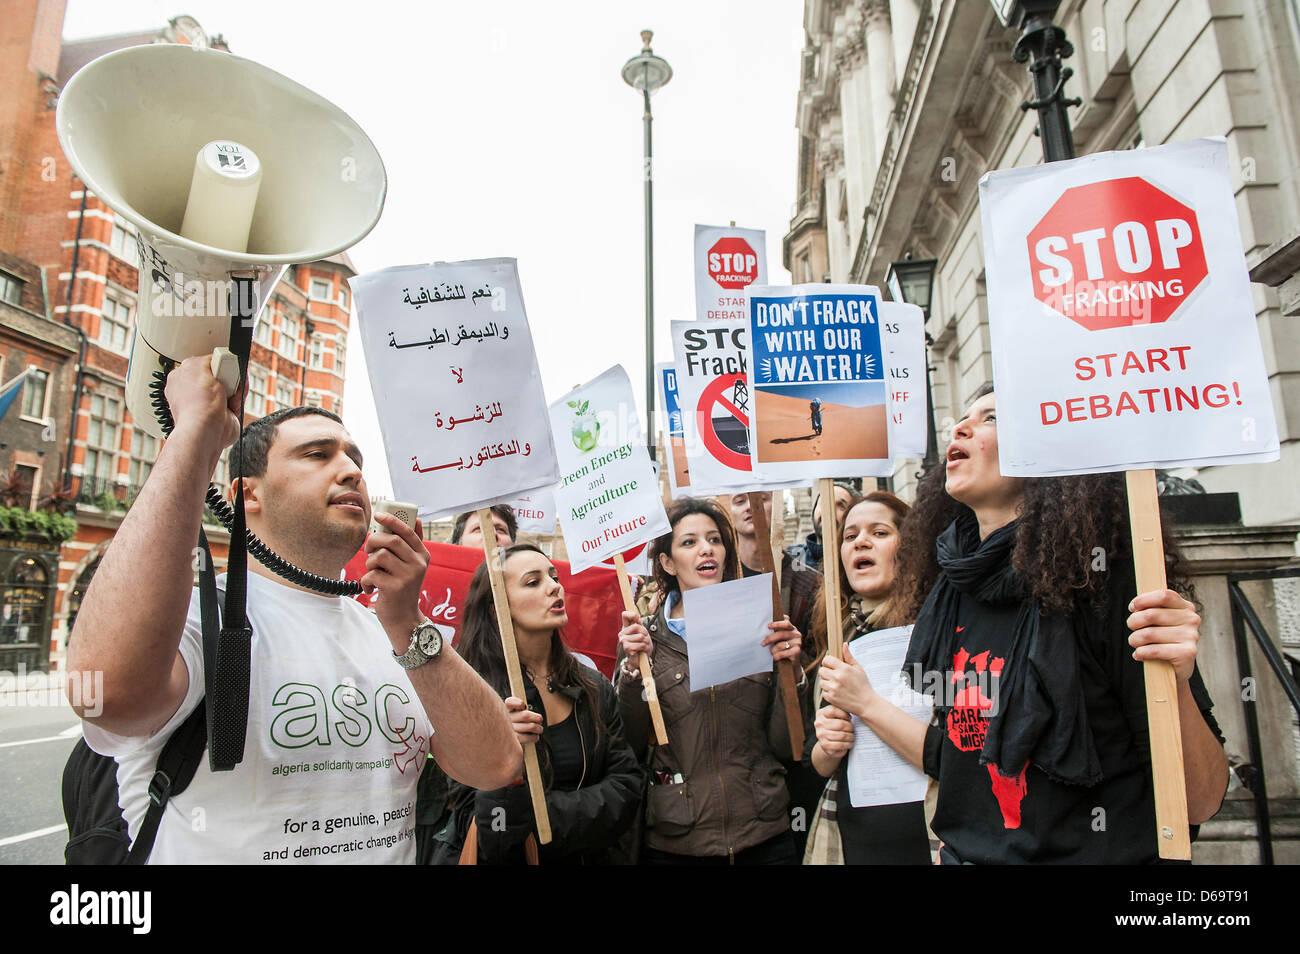 algerian escort london